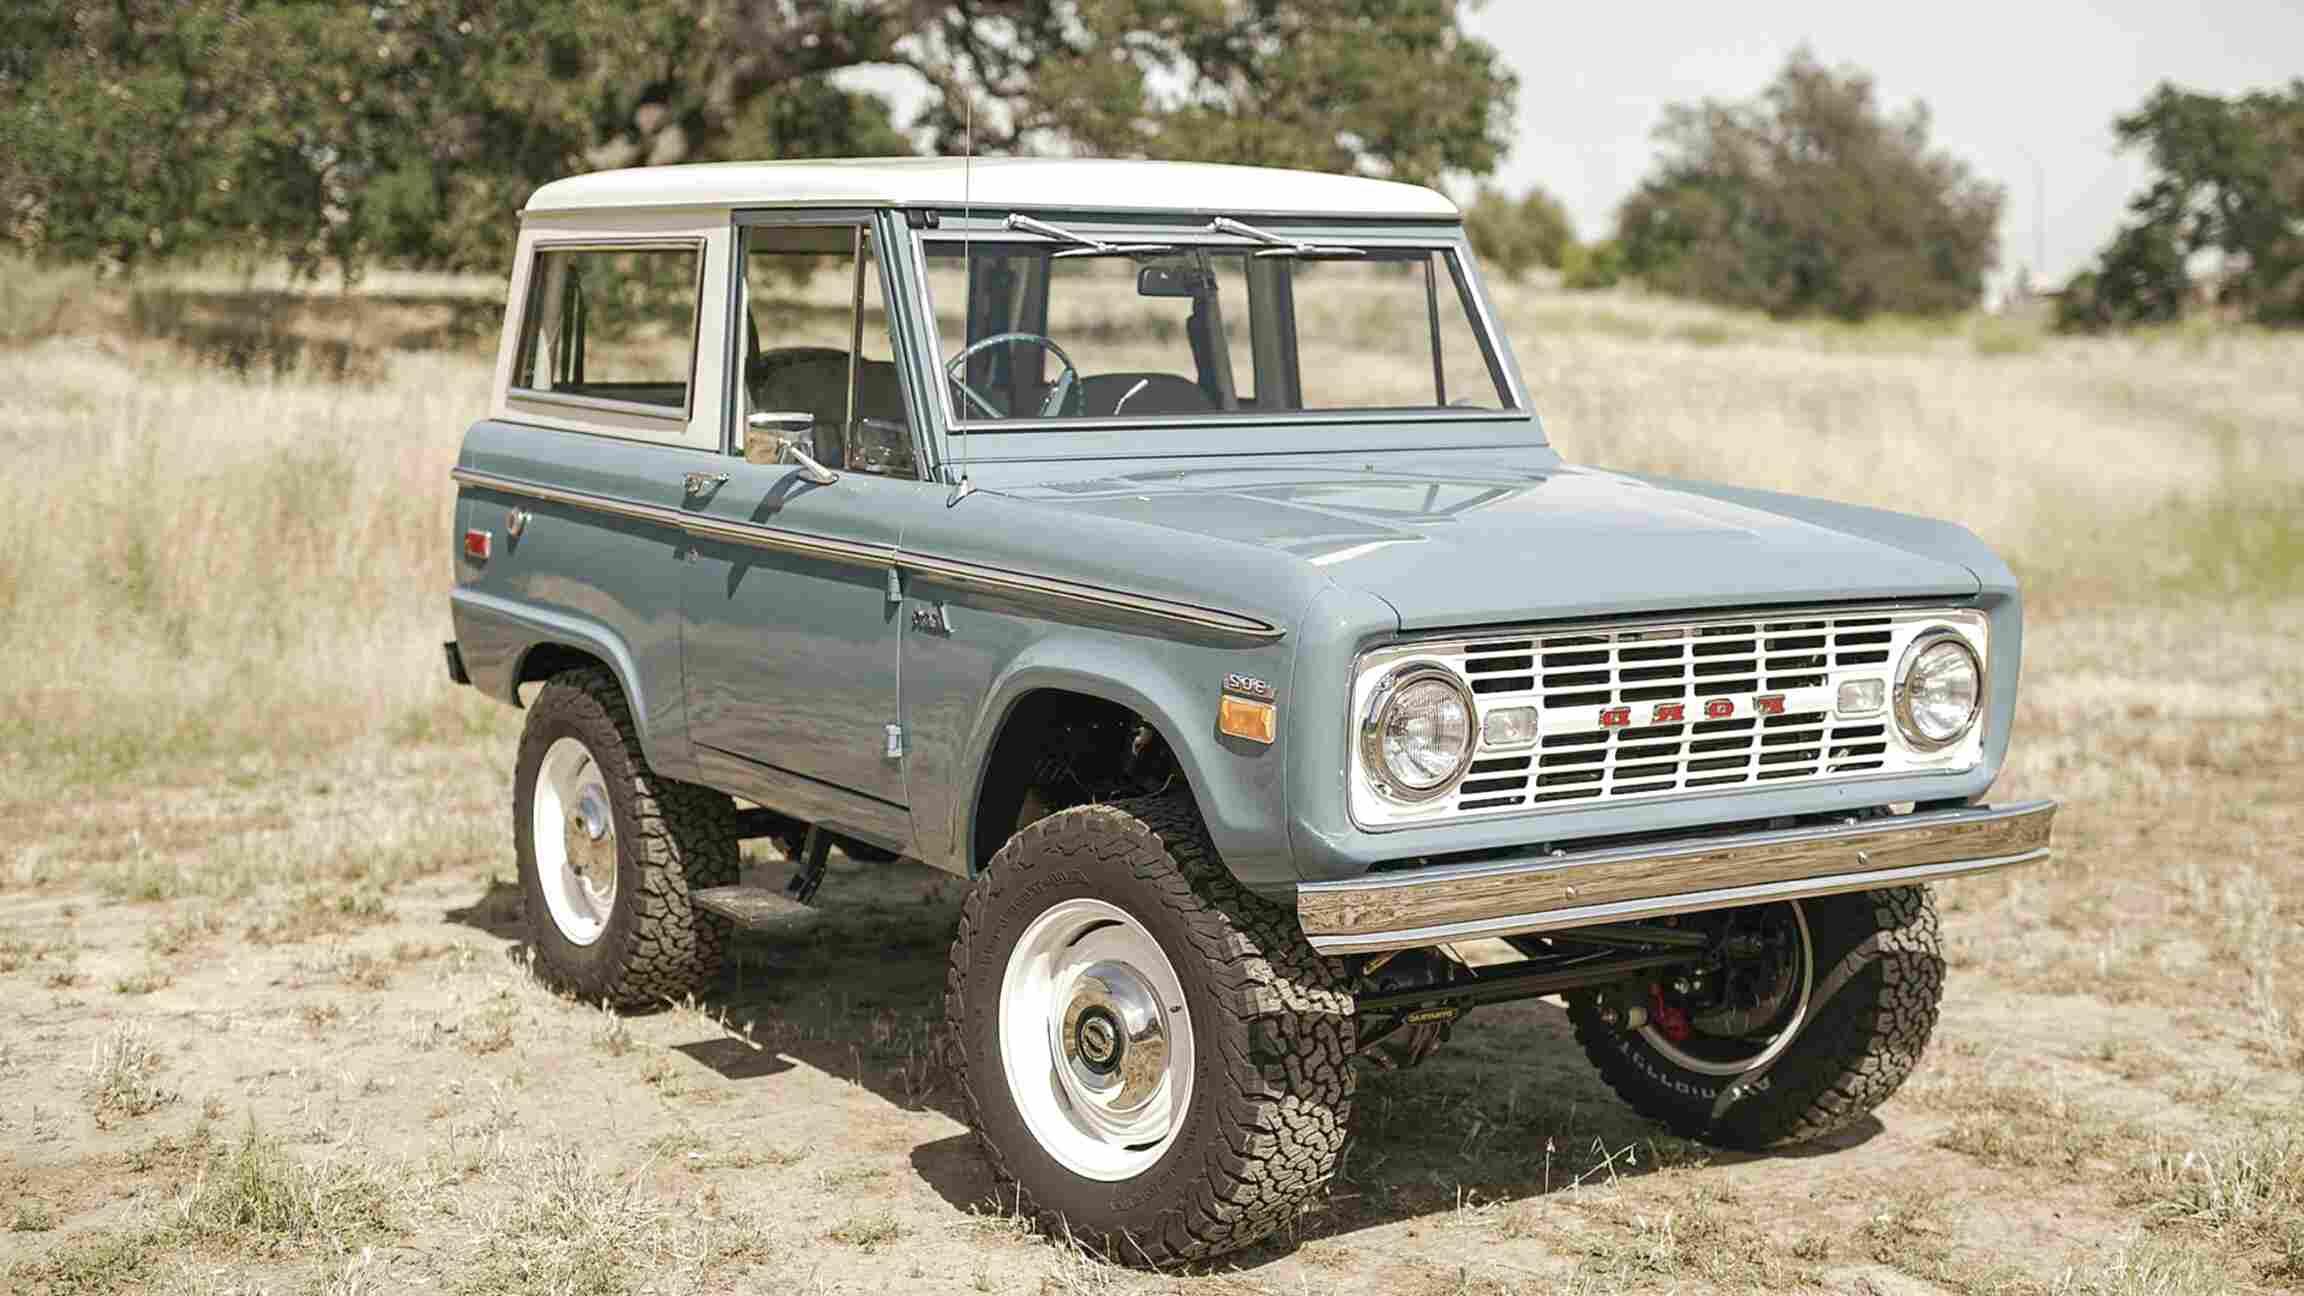 Original Ford Bronco For Sale In Canada